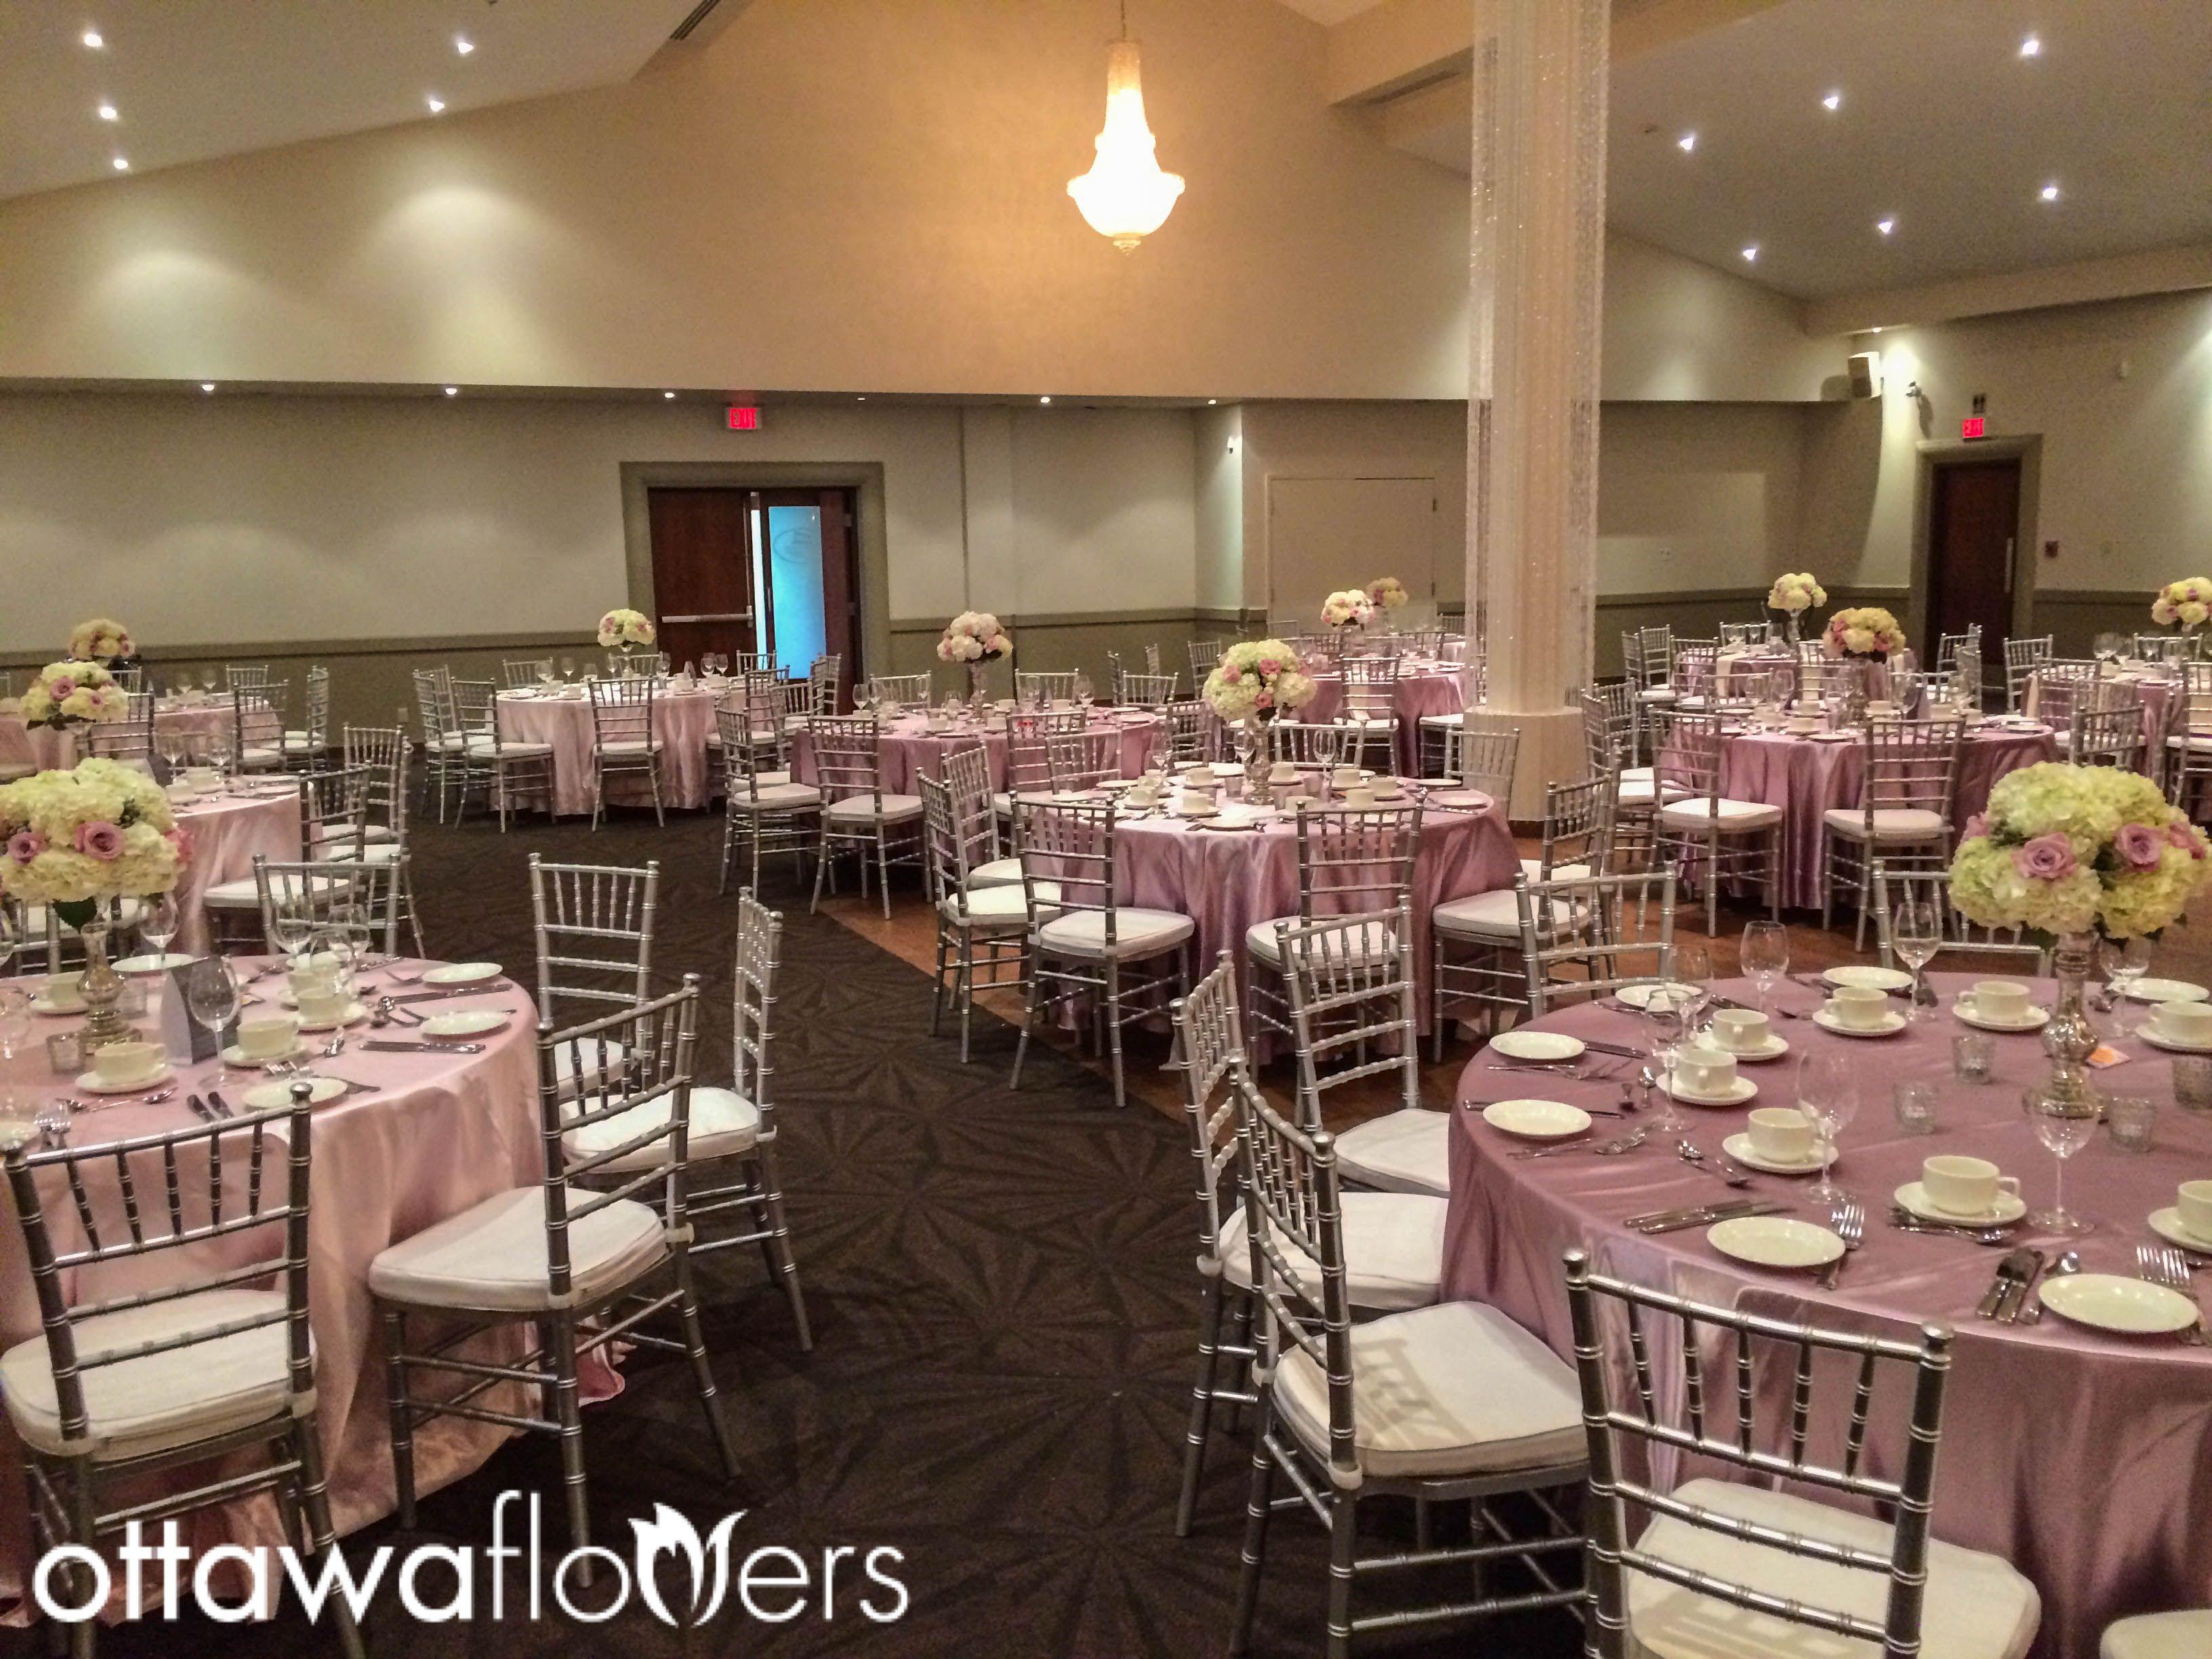 Ottawa Flowers Wedding Decor Reception Jewellery